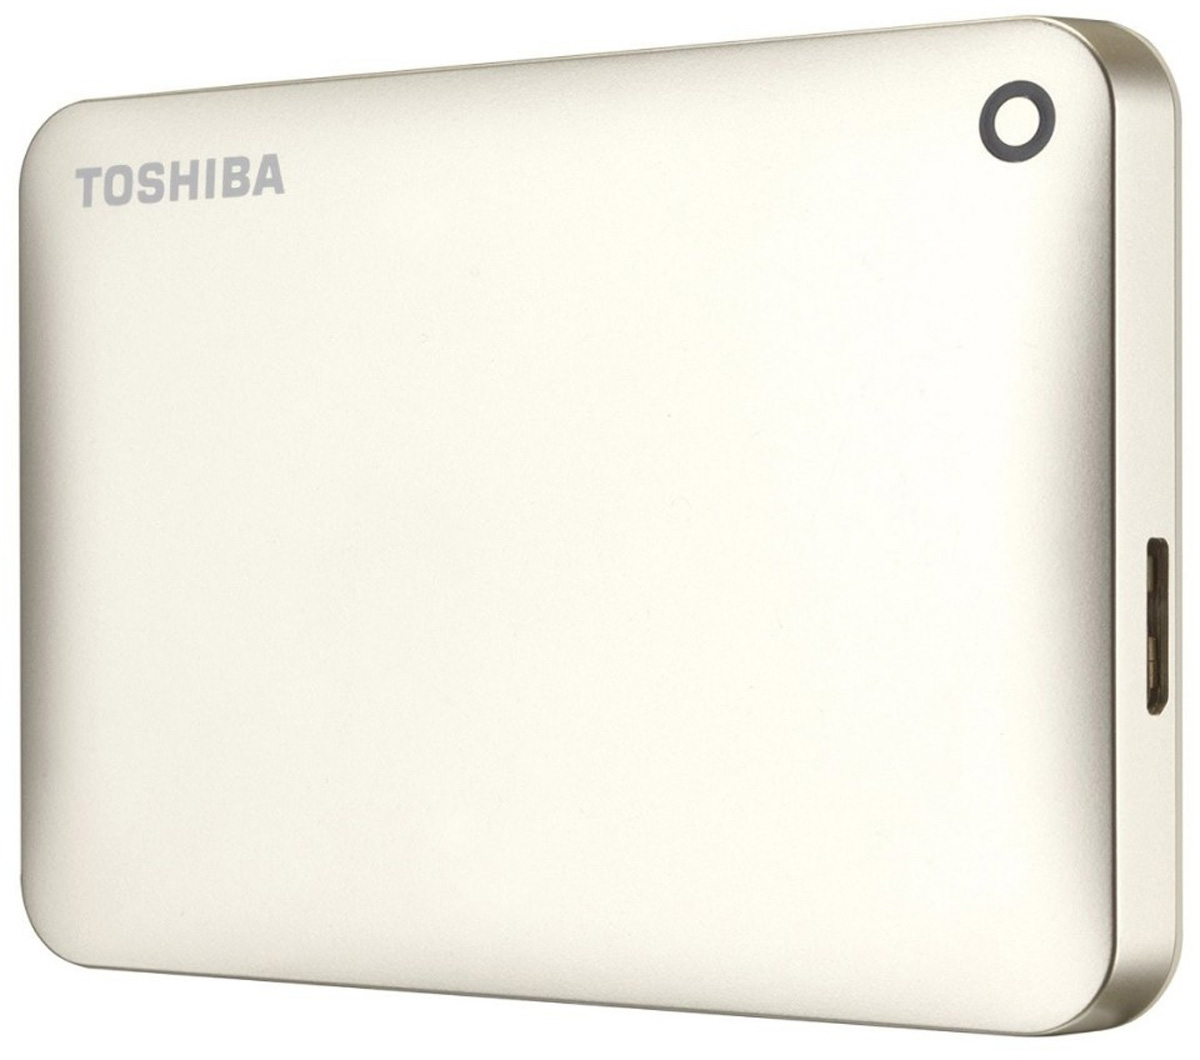 Toshiba Canvio Connect II 3TB, Gold внешний жесткий диск (HDTC830EC3CA) - Носители информации